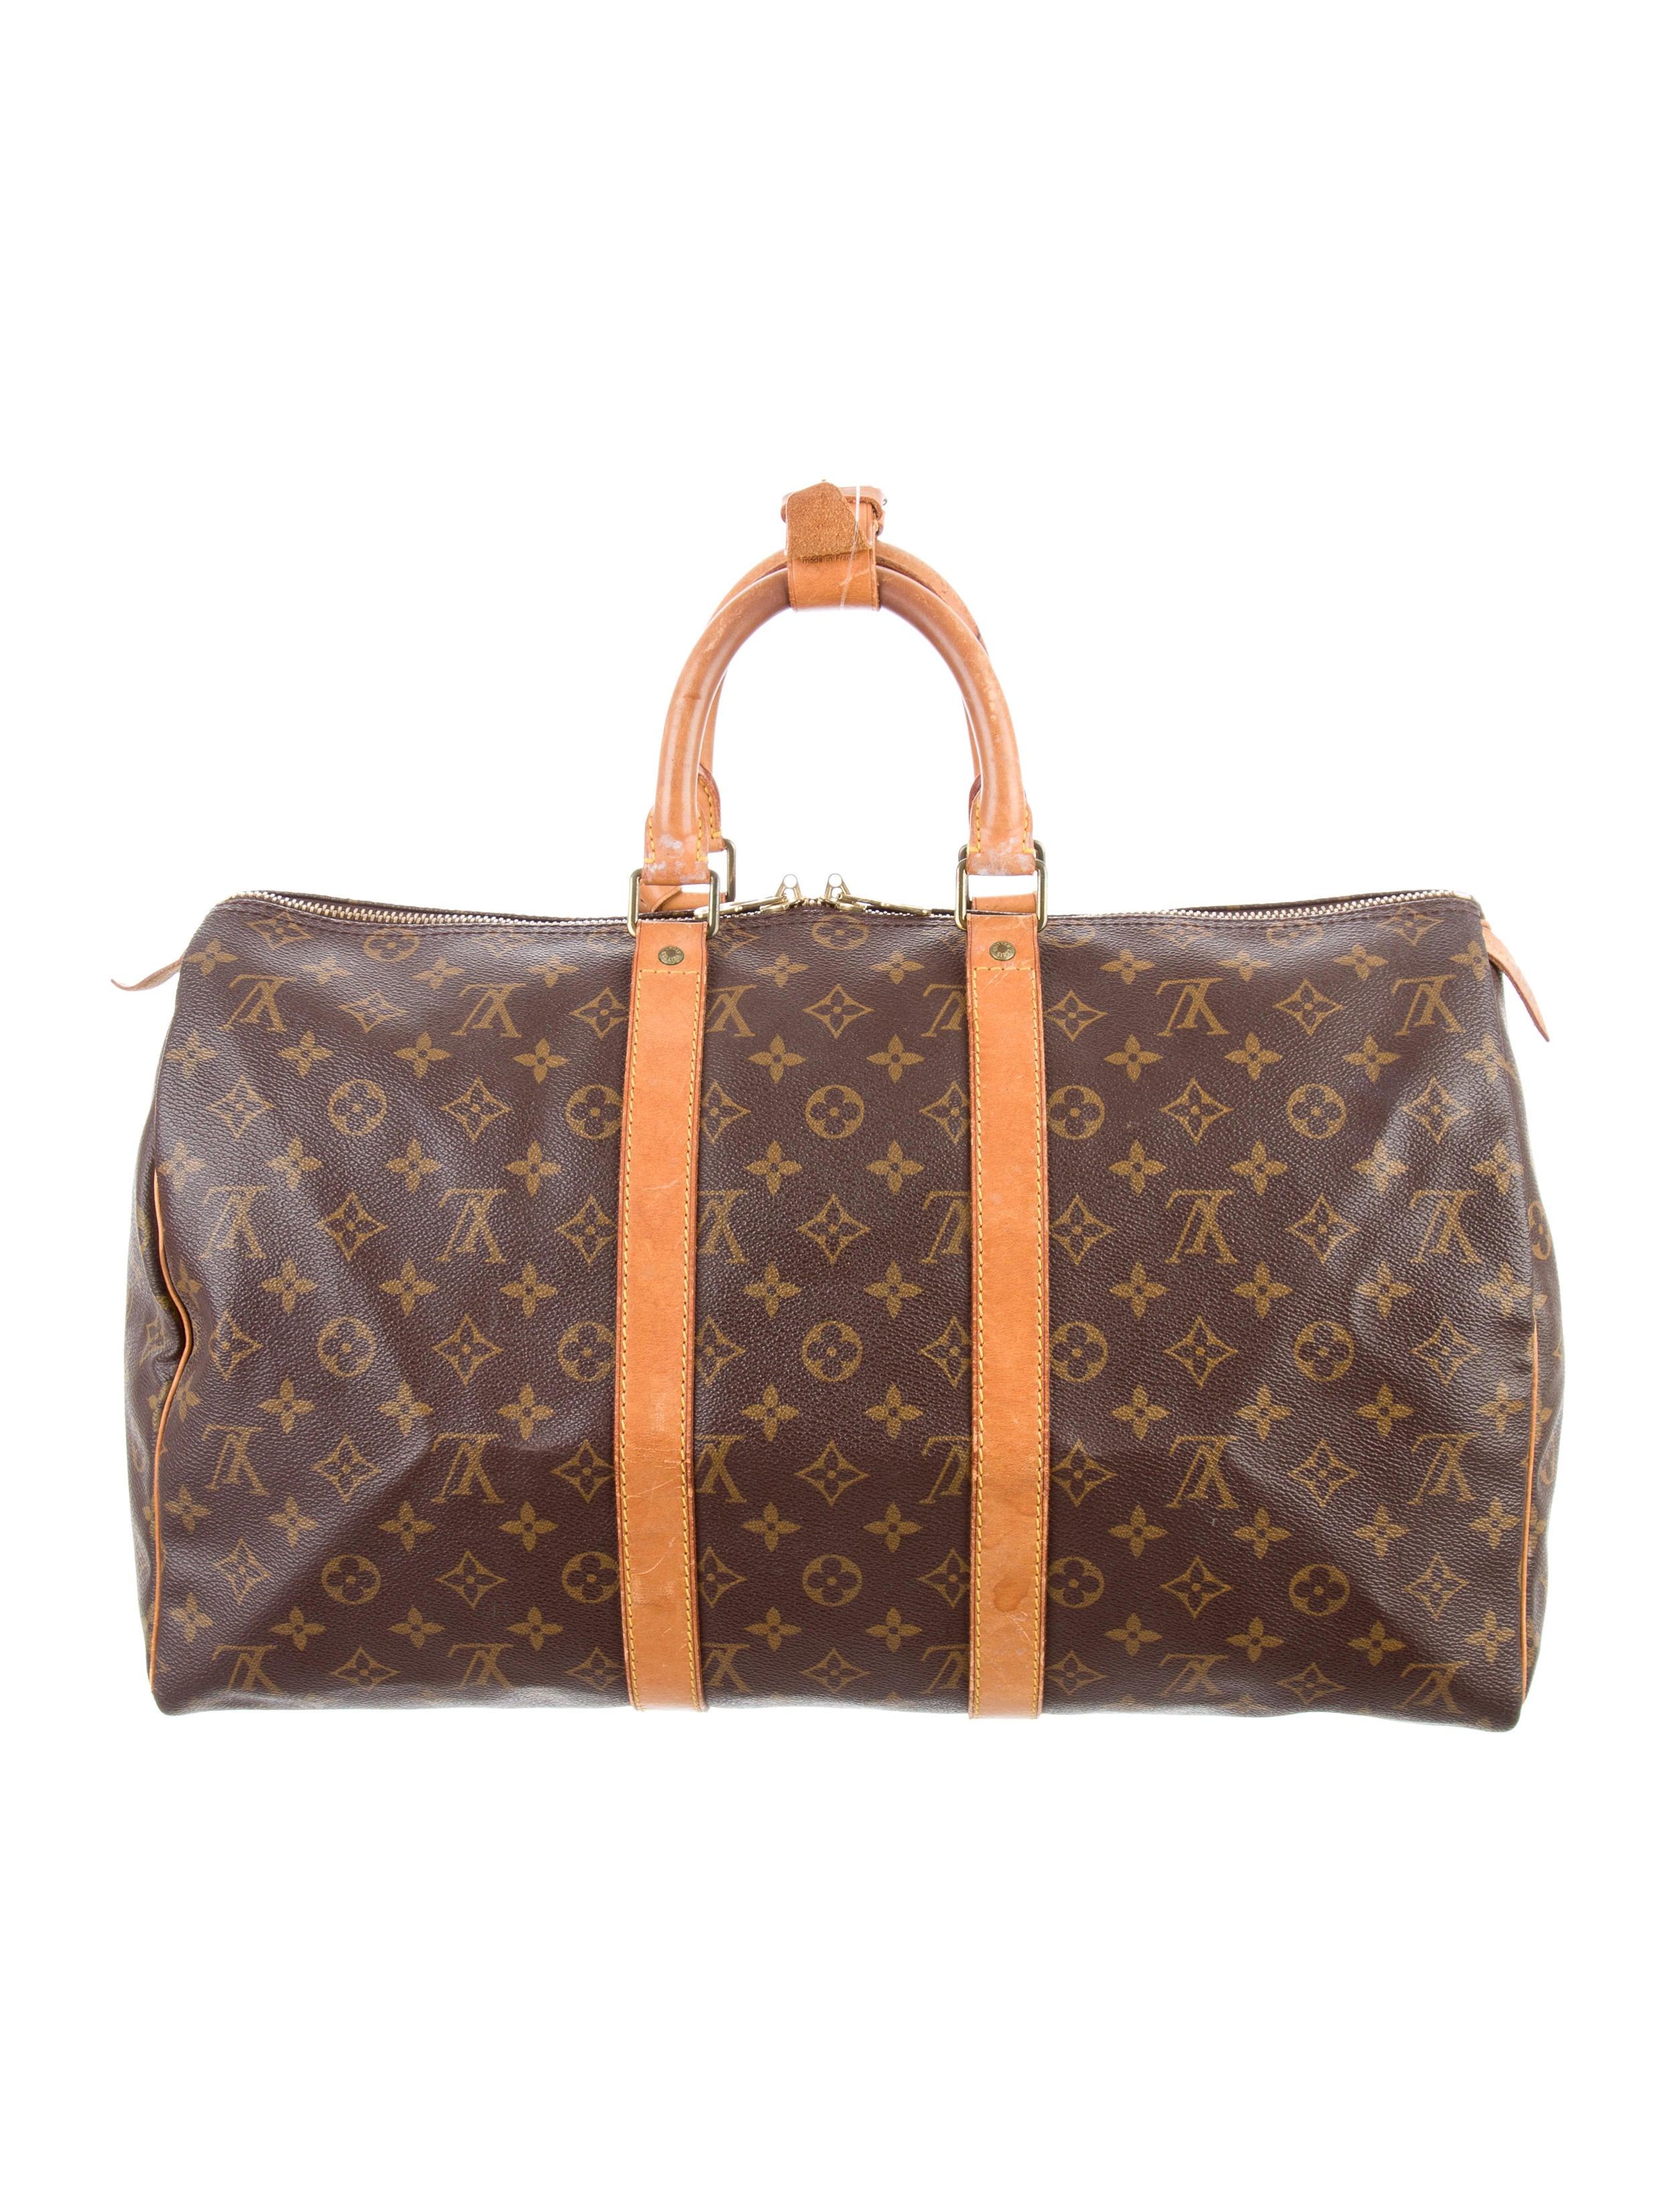 Louis Vuitton Monogram Keepall 45 - Handbags - LOU118322